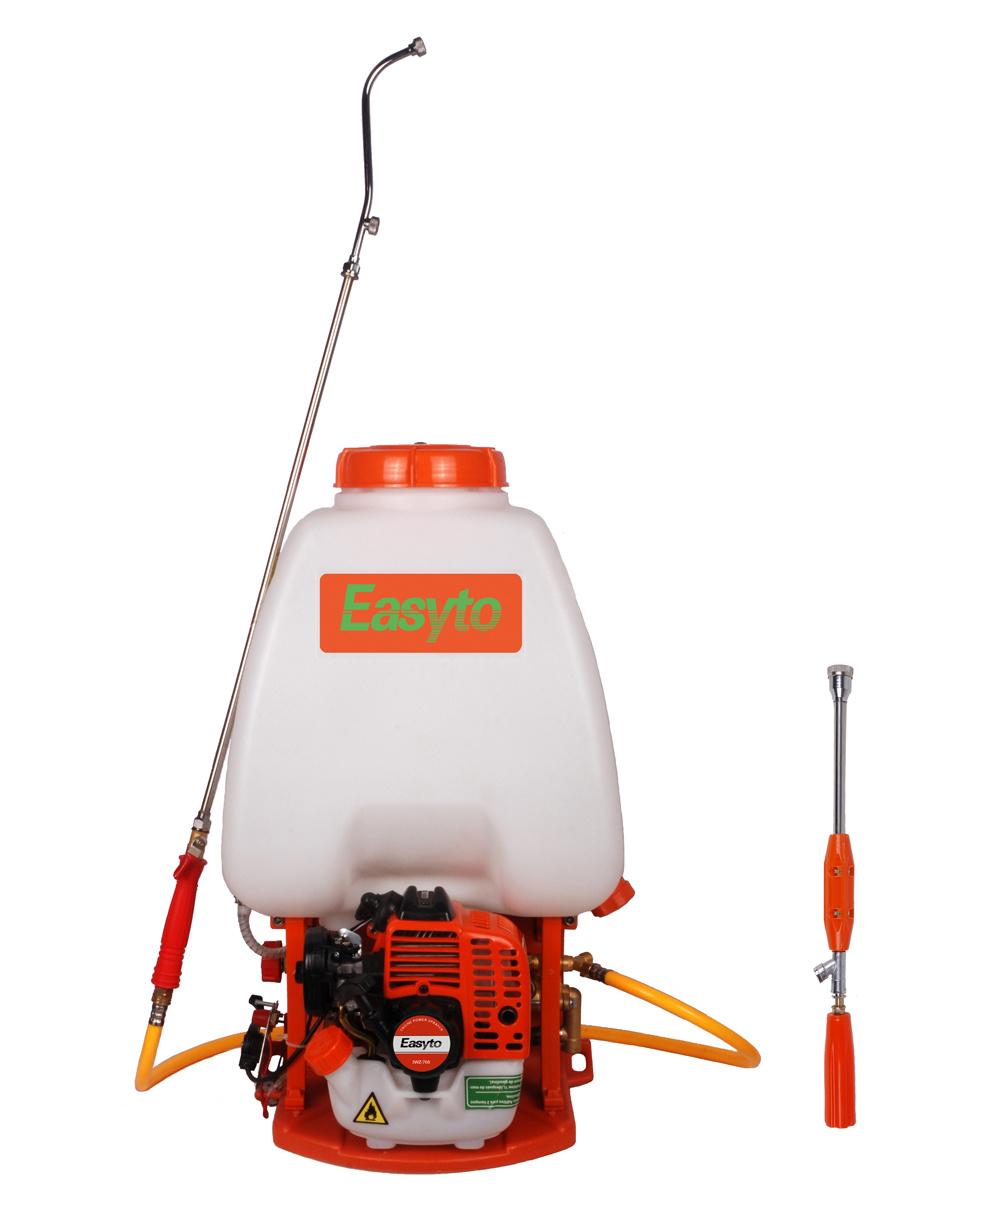 Knapsack Power Sprayer for Agricultural Use (3WZ-768)